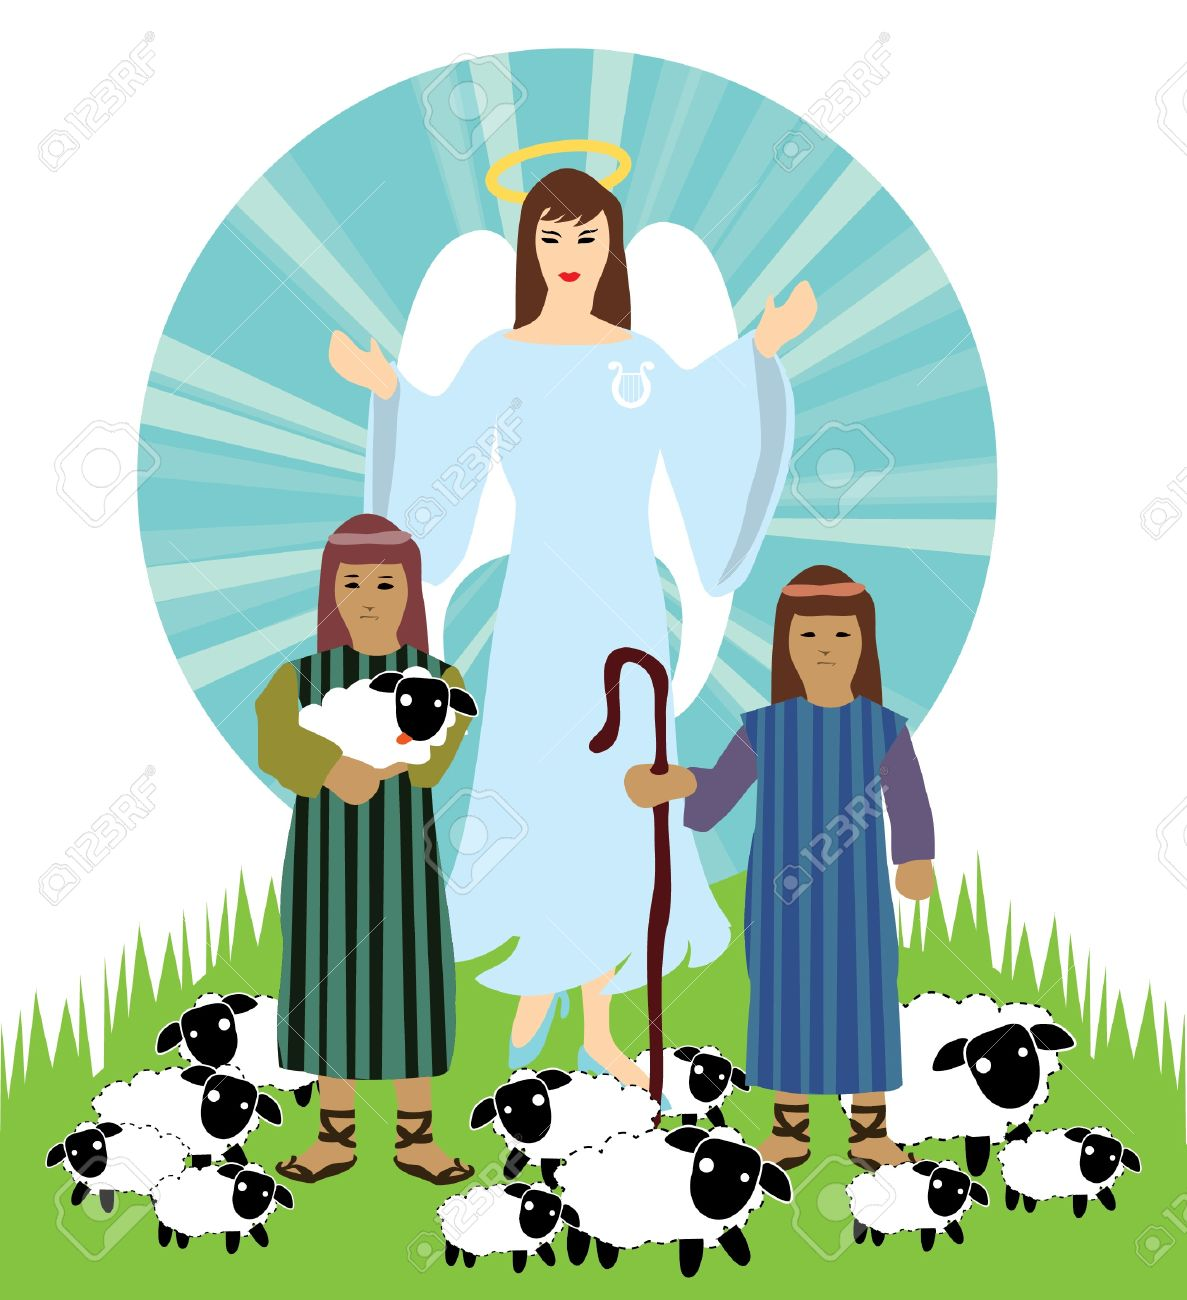 hight resolution of christmas nativity scene angel and shepherd royalty free cliparts jpg 1187x1300 nativity shepherds clipart